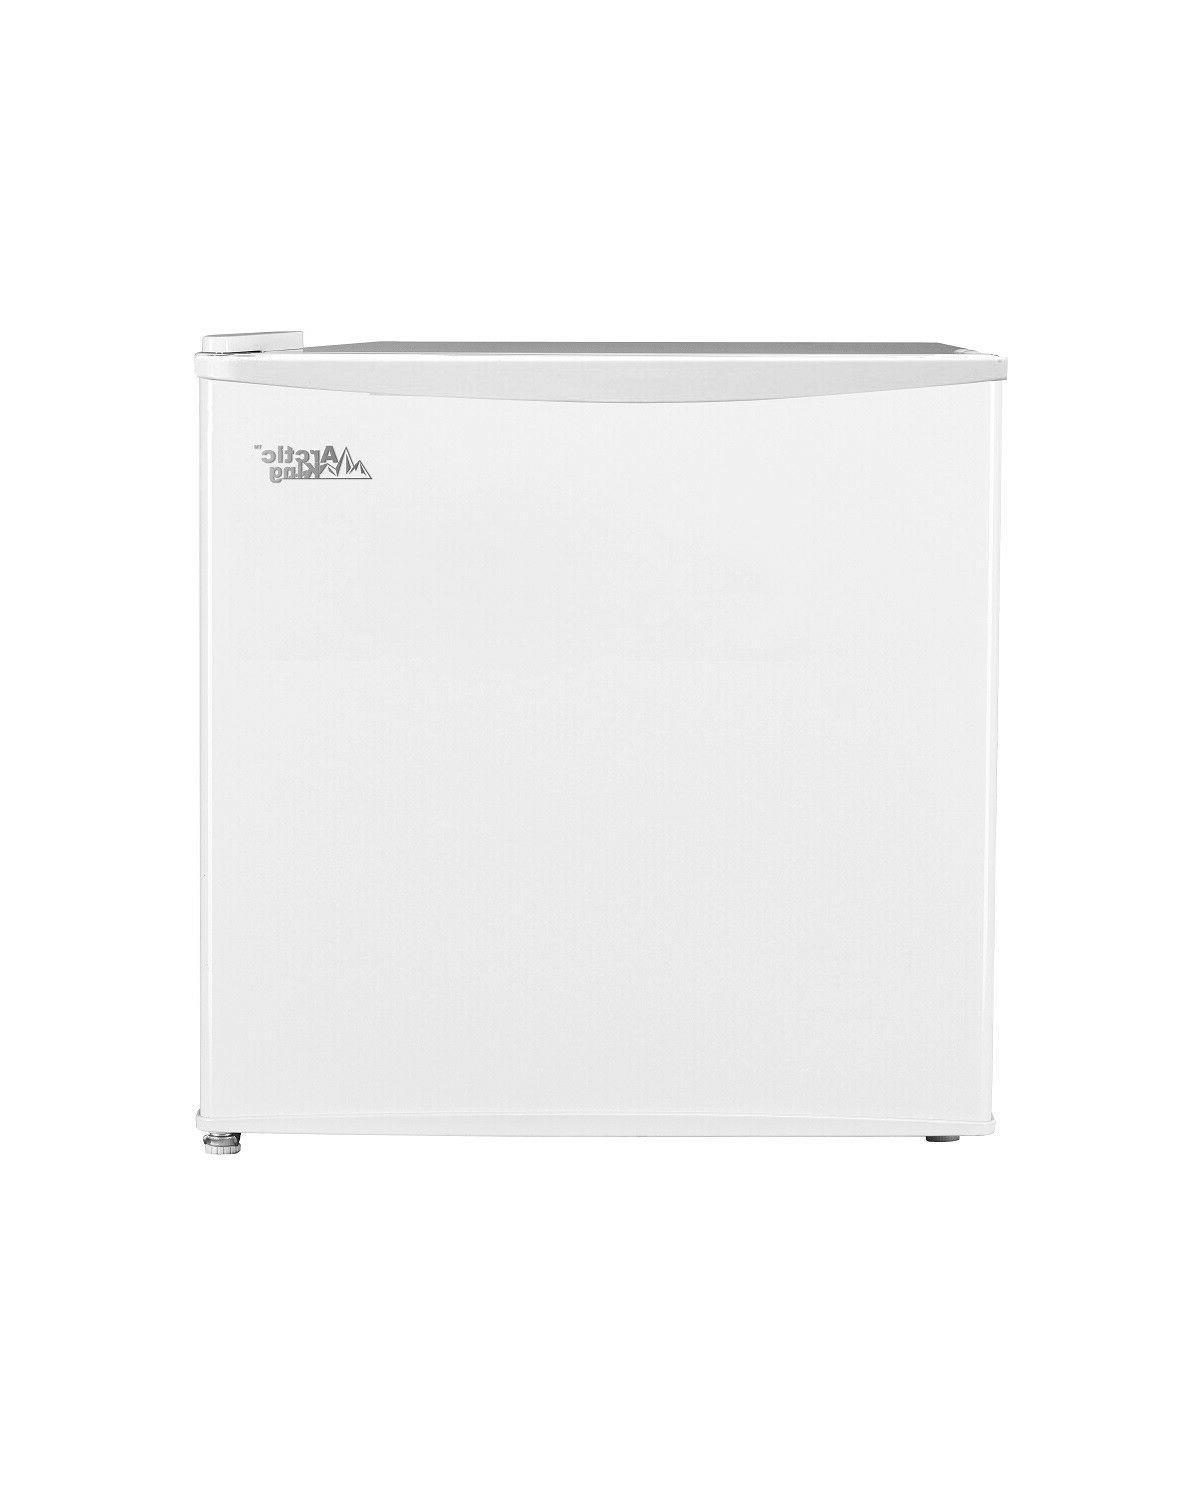 1.1 cu Freezer Unit Compact Home Space Saver Energy Efficient White